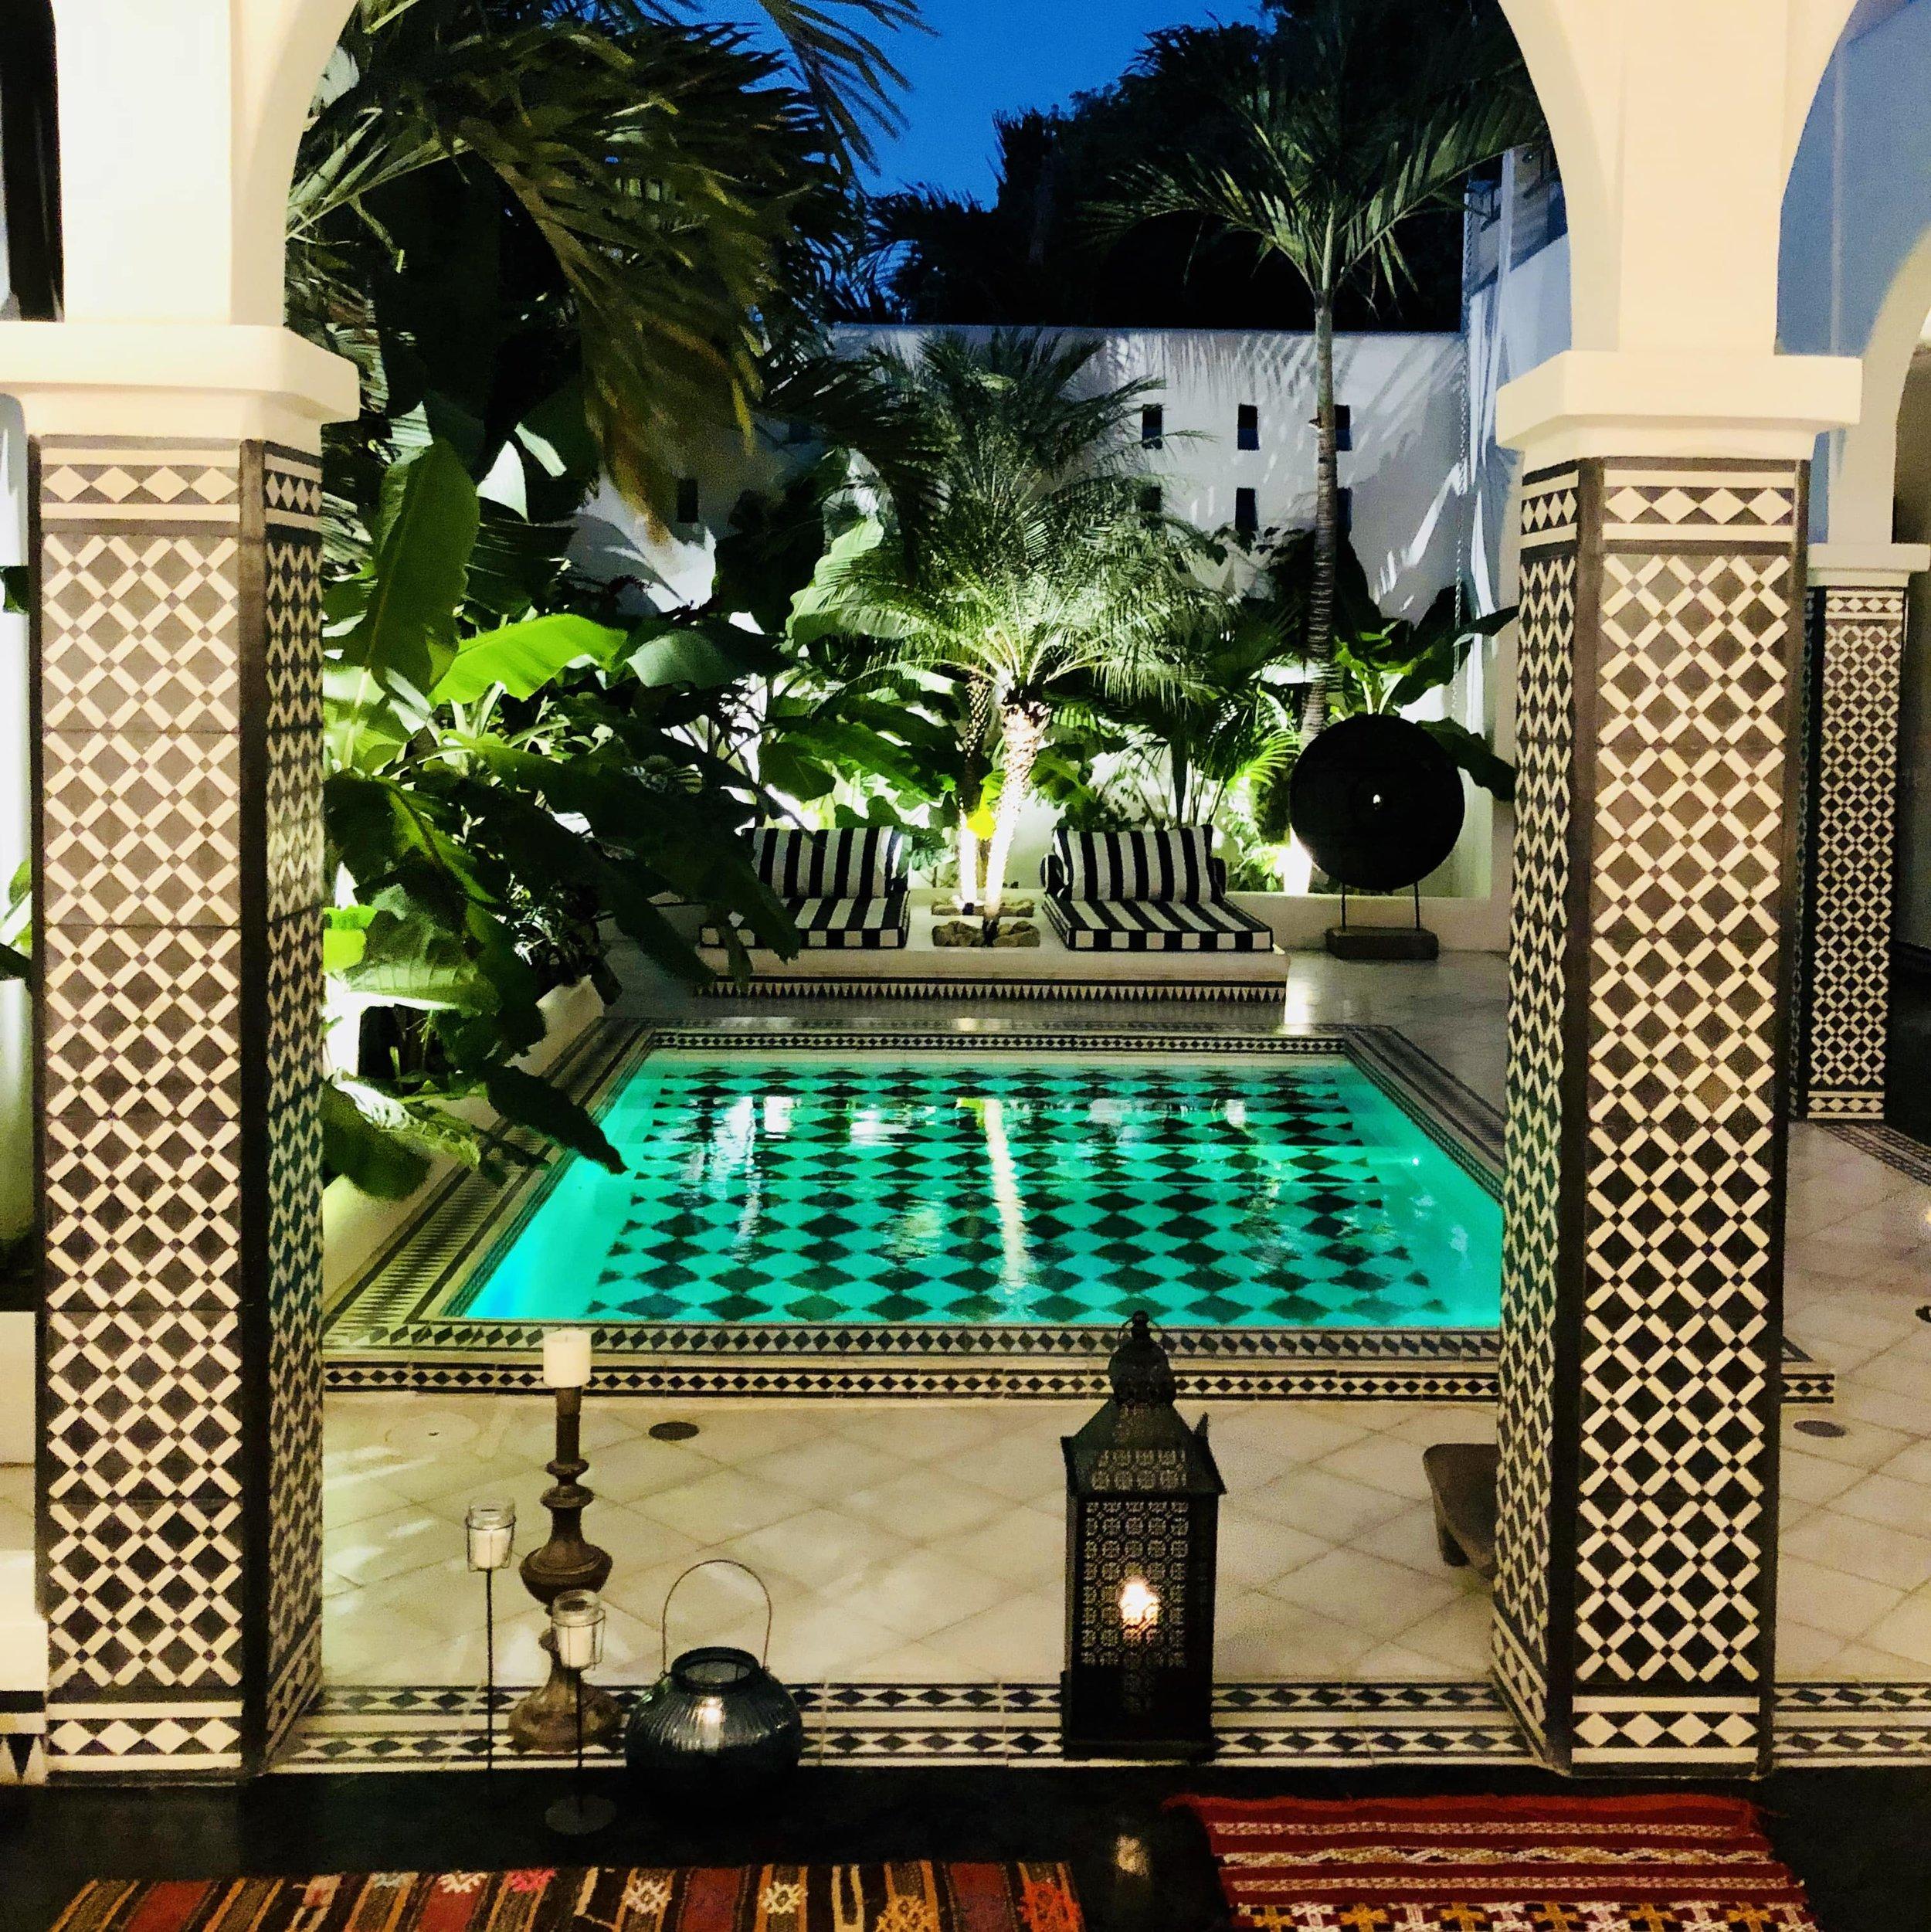 Real Estate For Sale Granada Nicaragua 11-min.jpeg